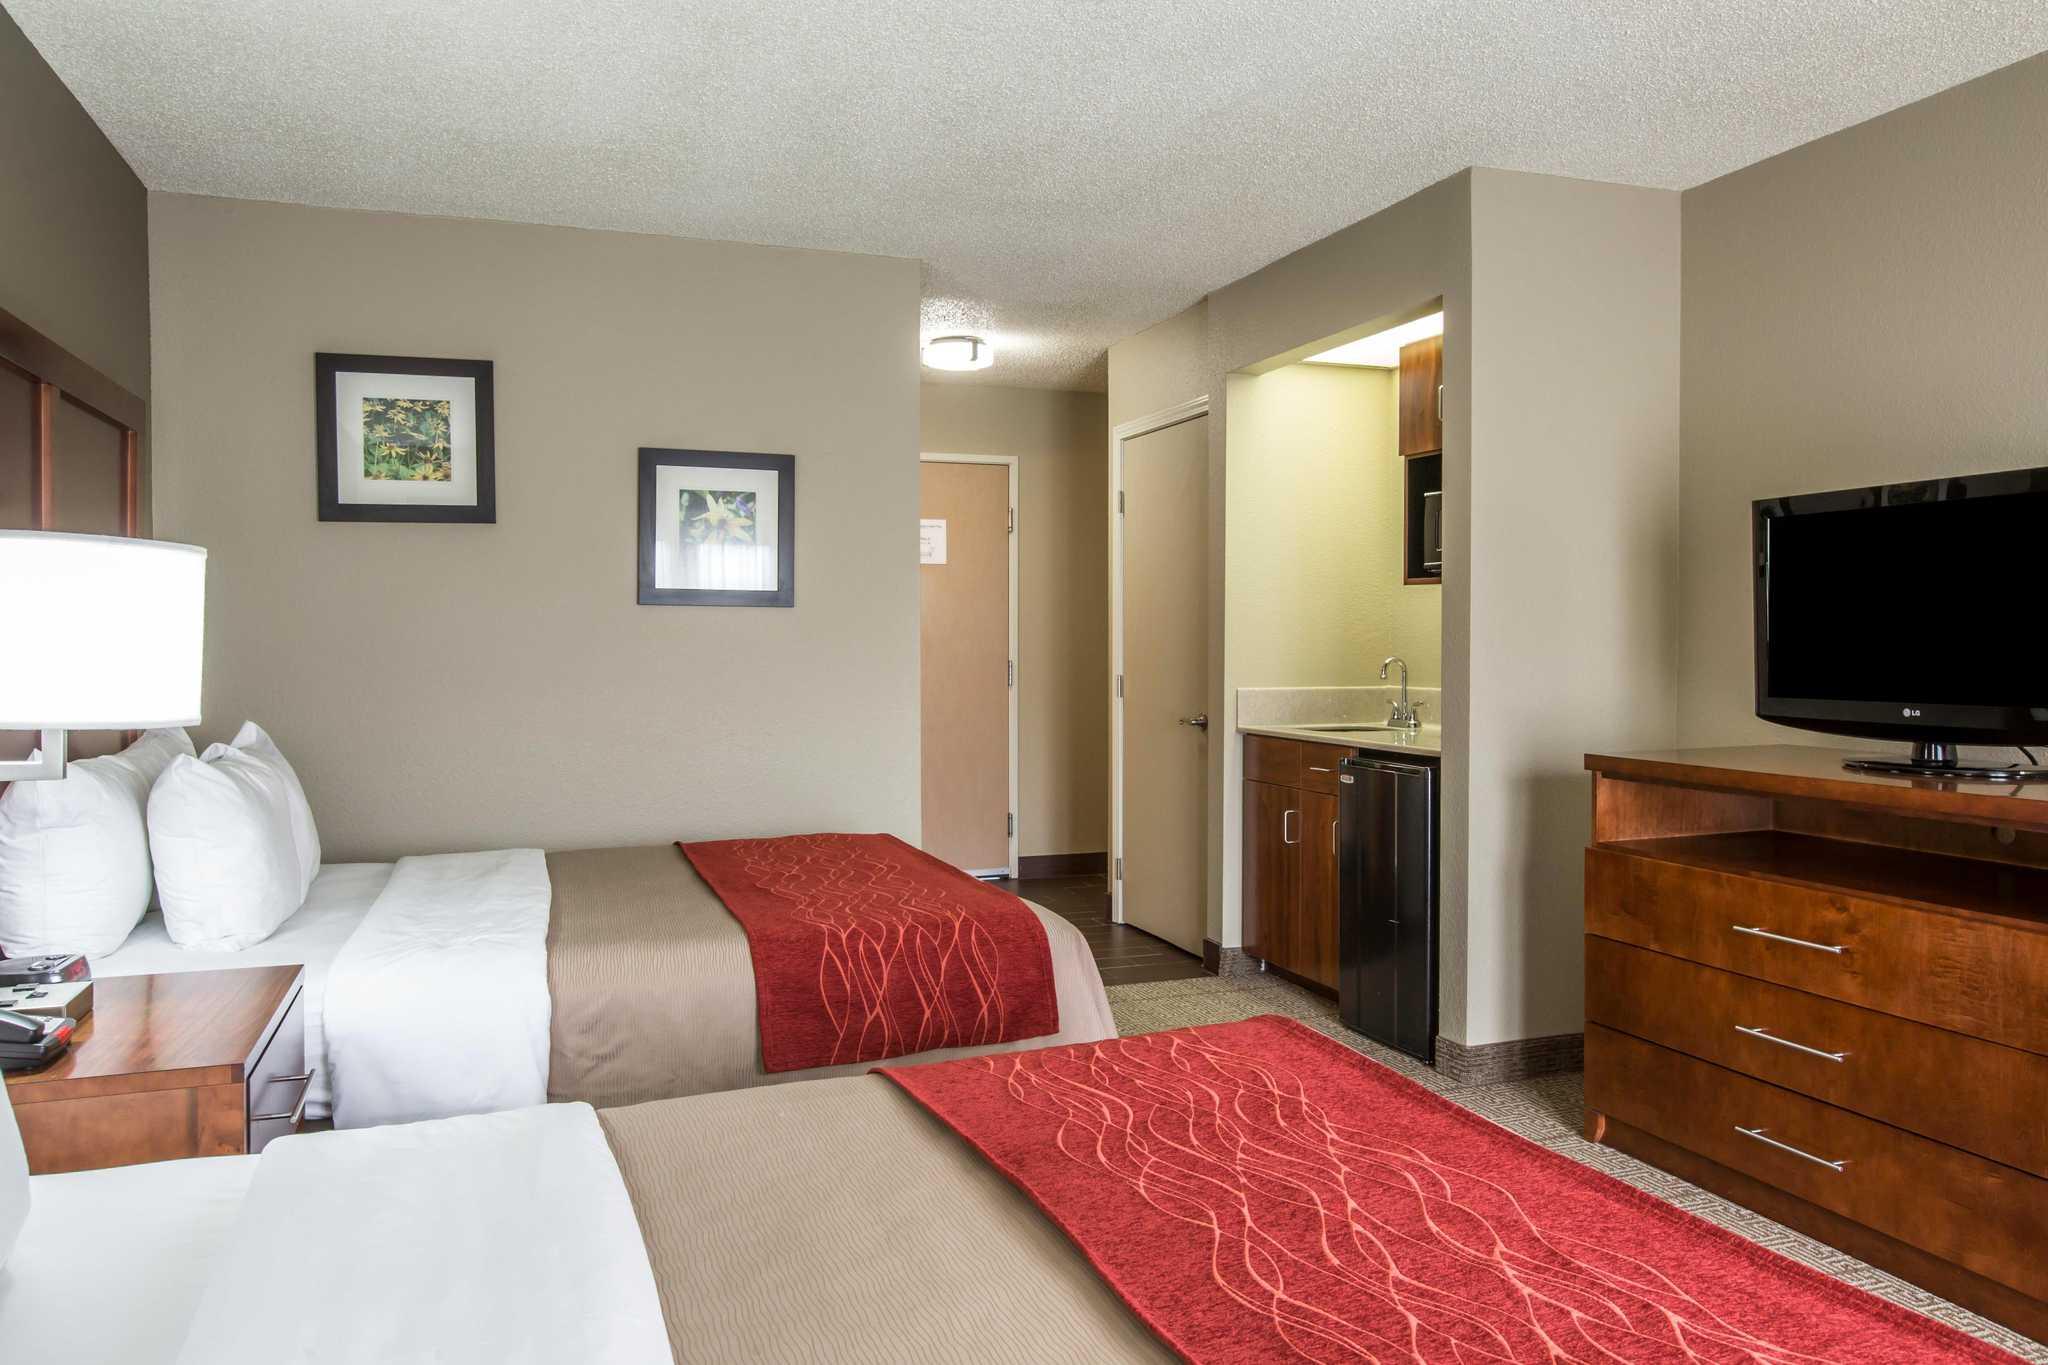 Comfort Inn & Suites at Dollywood Lane image 4